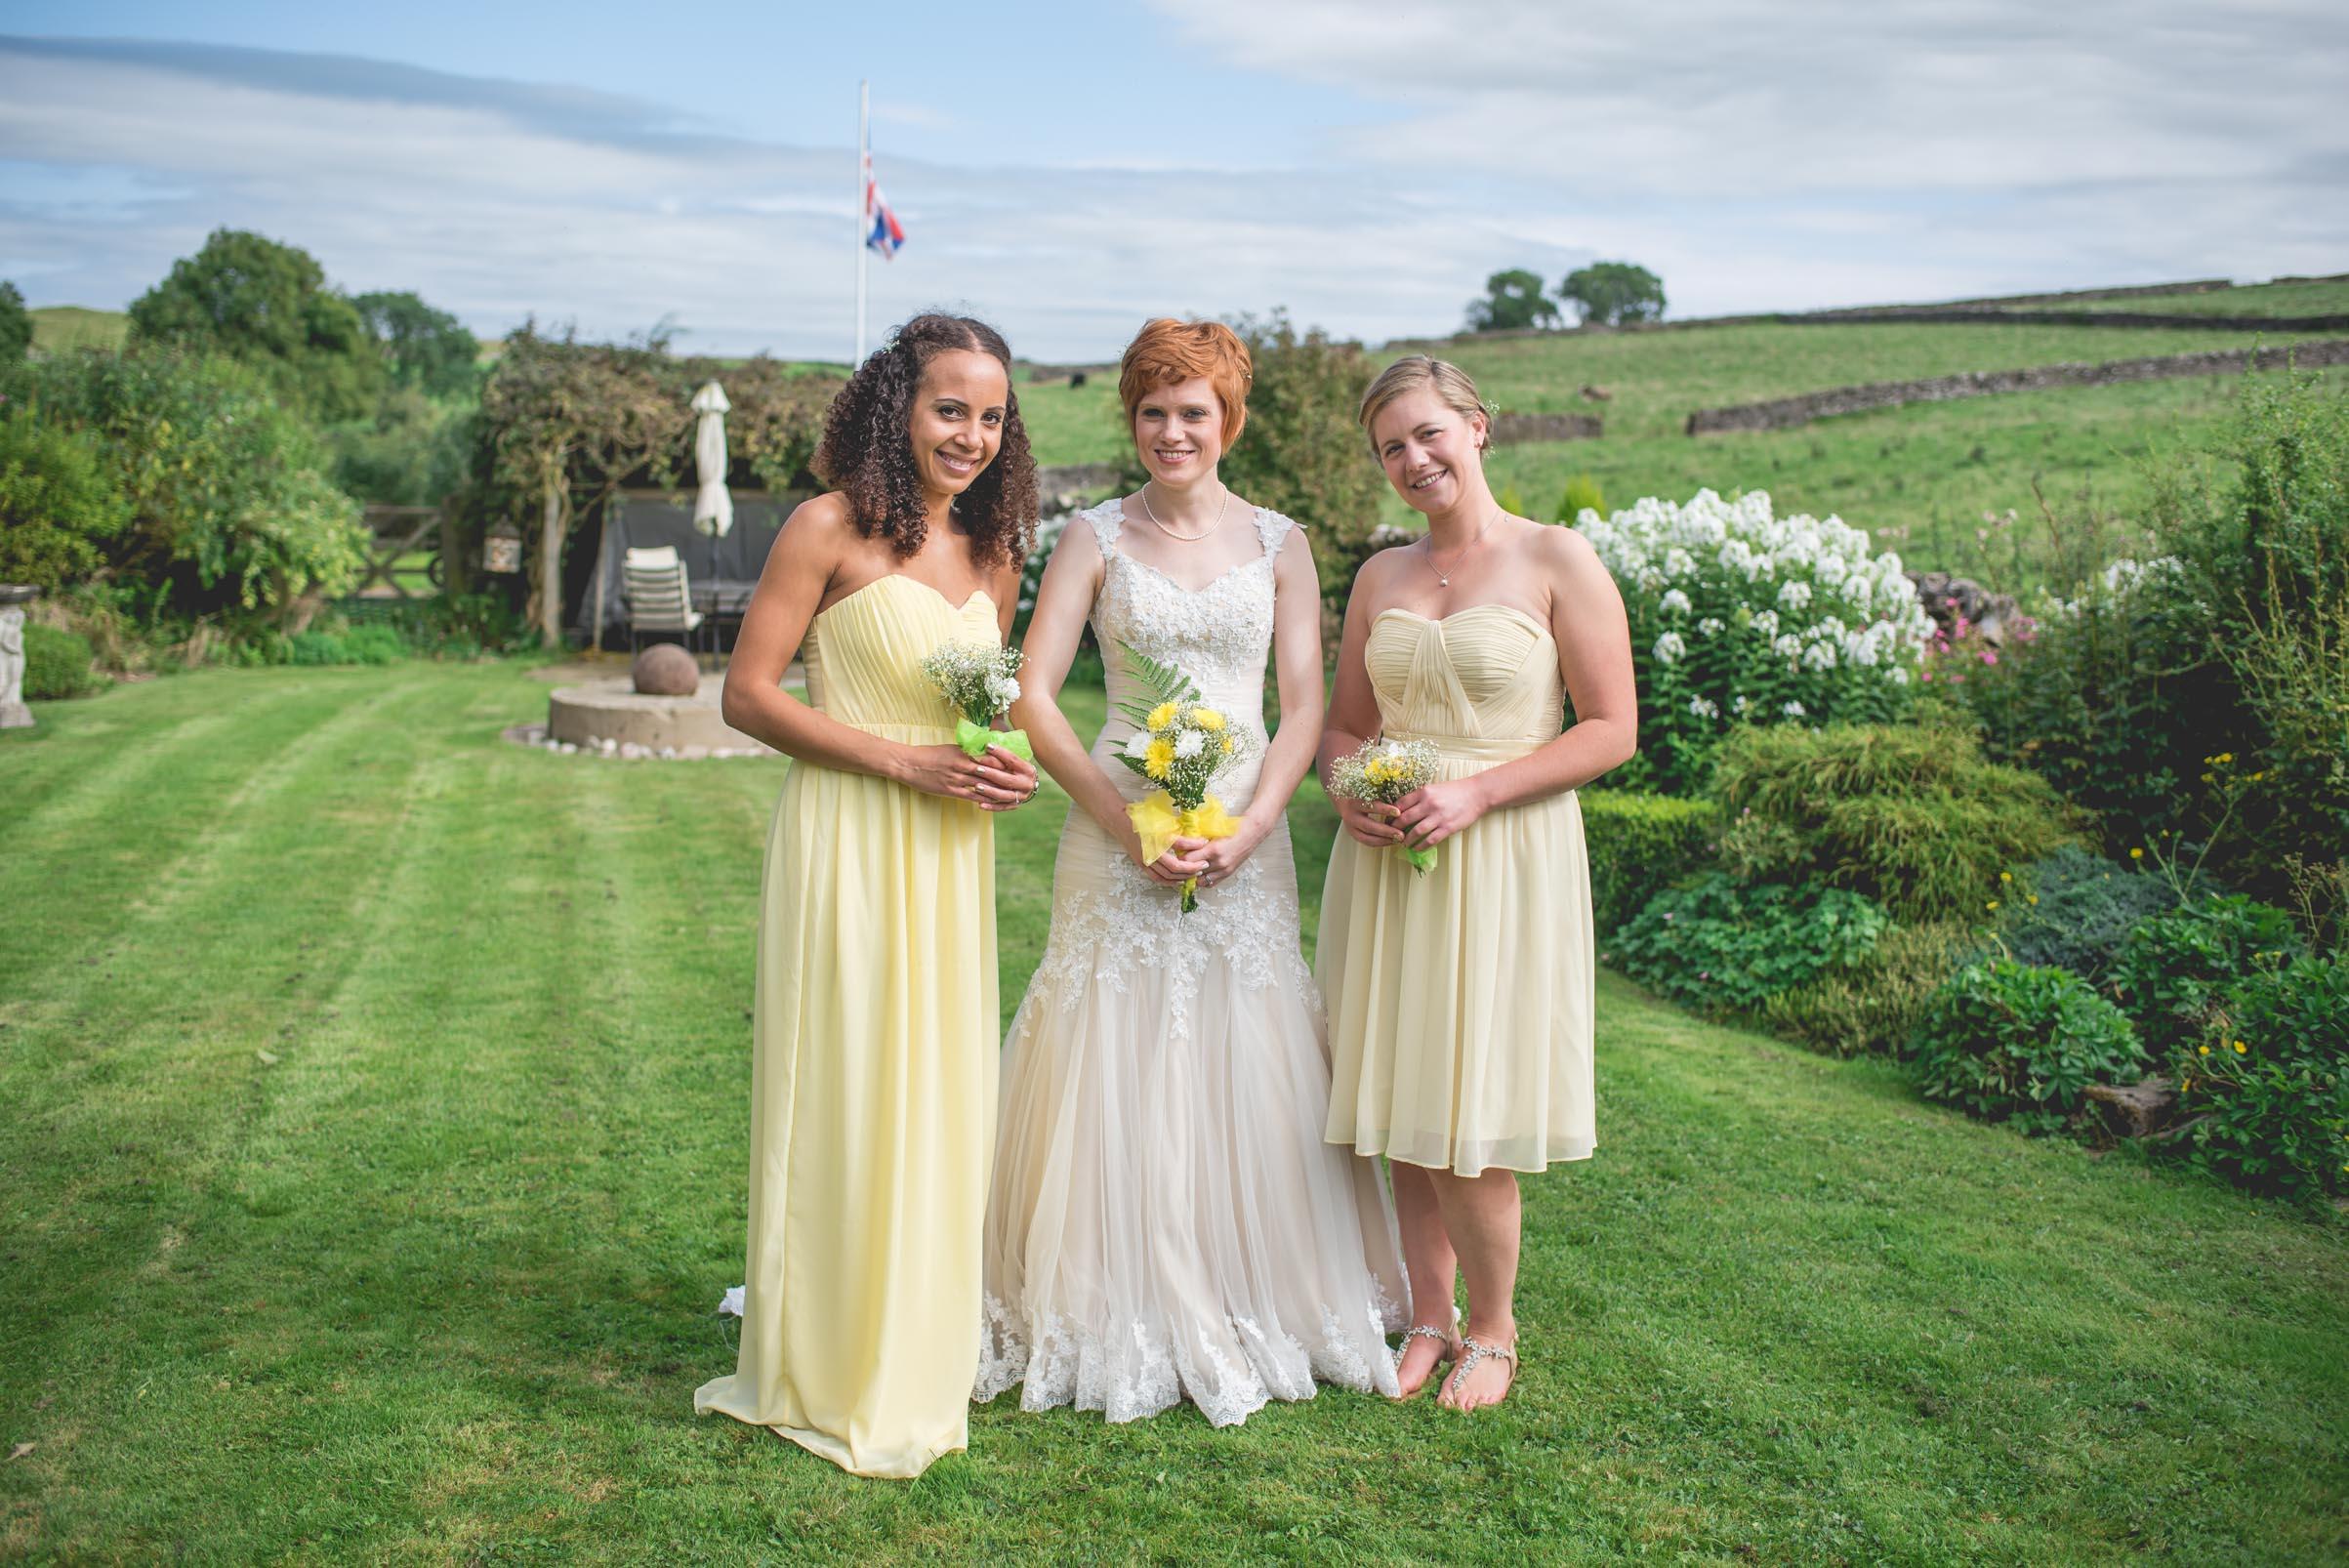 Peak+district+farm+wedding+lower+damgate+photographer-70.jpg